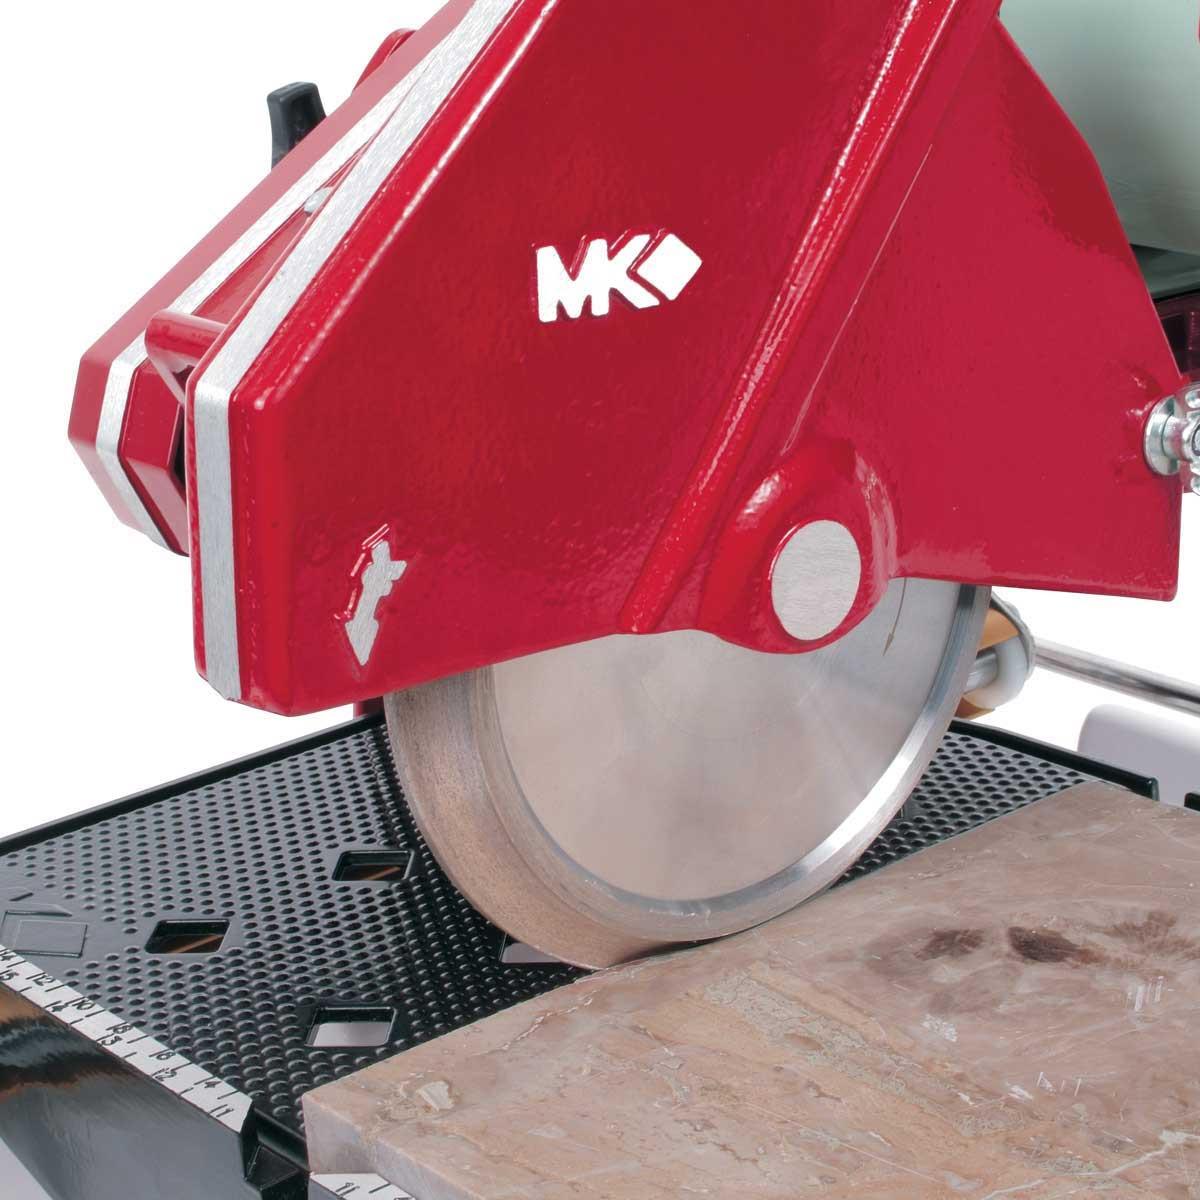 MK 101-24 tile saw with marble diamond profiling wheel